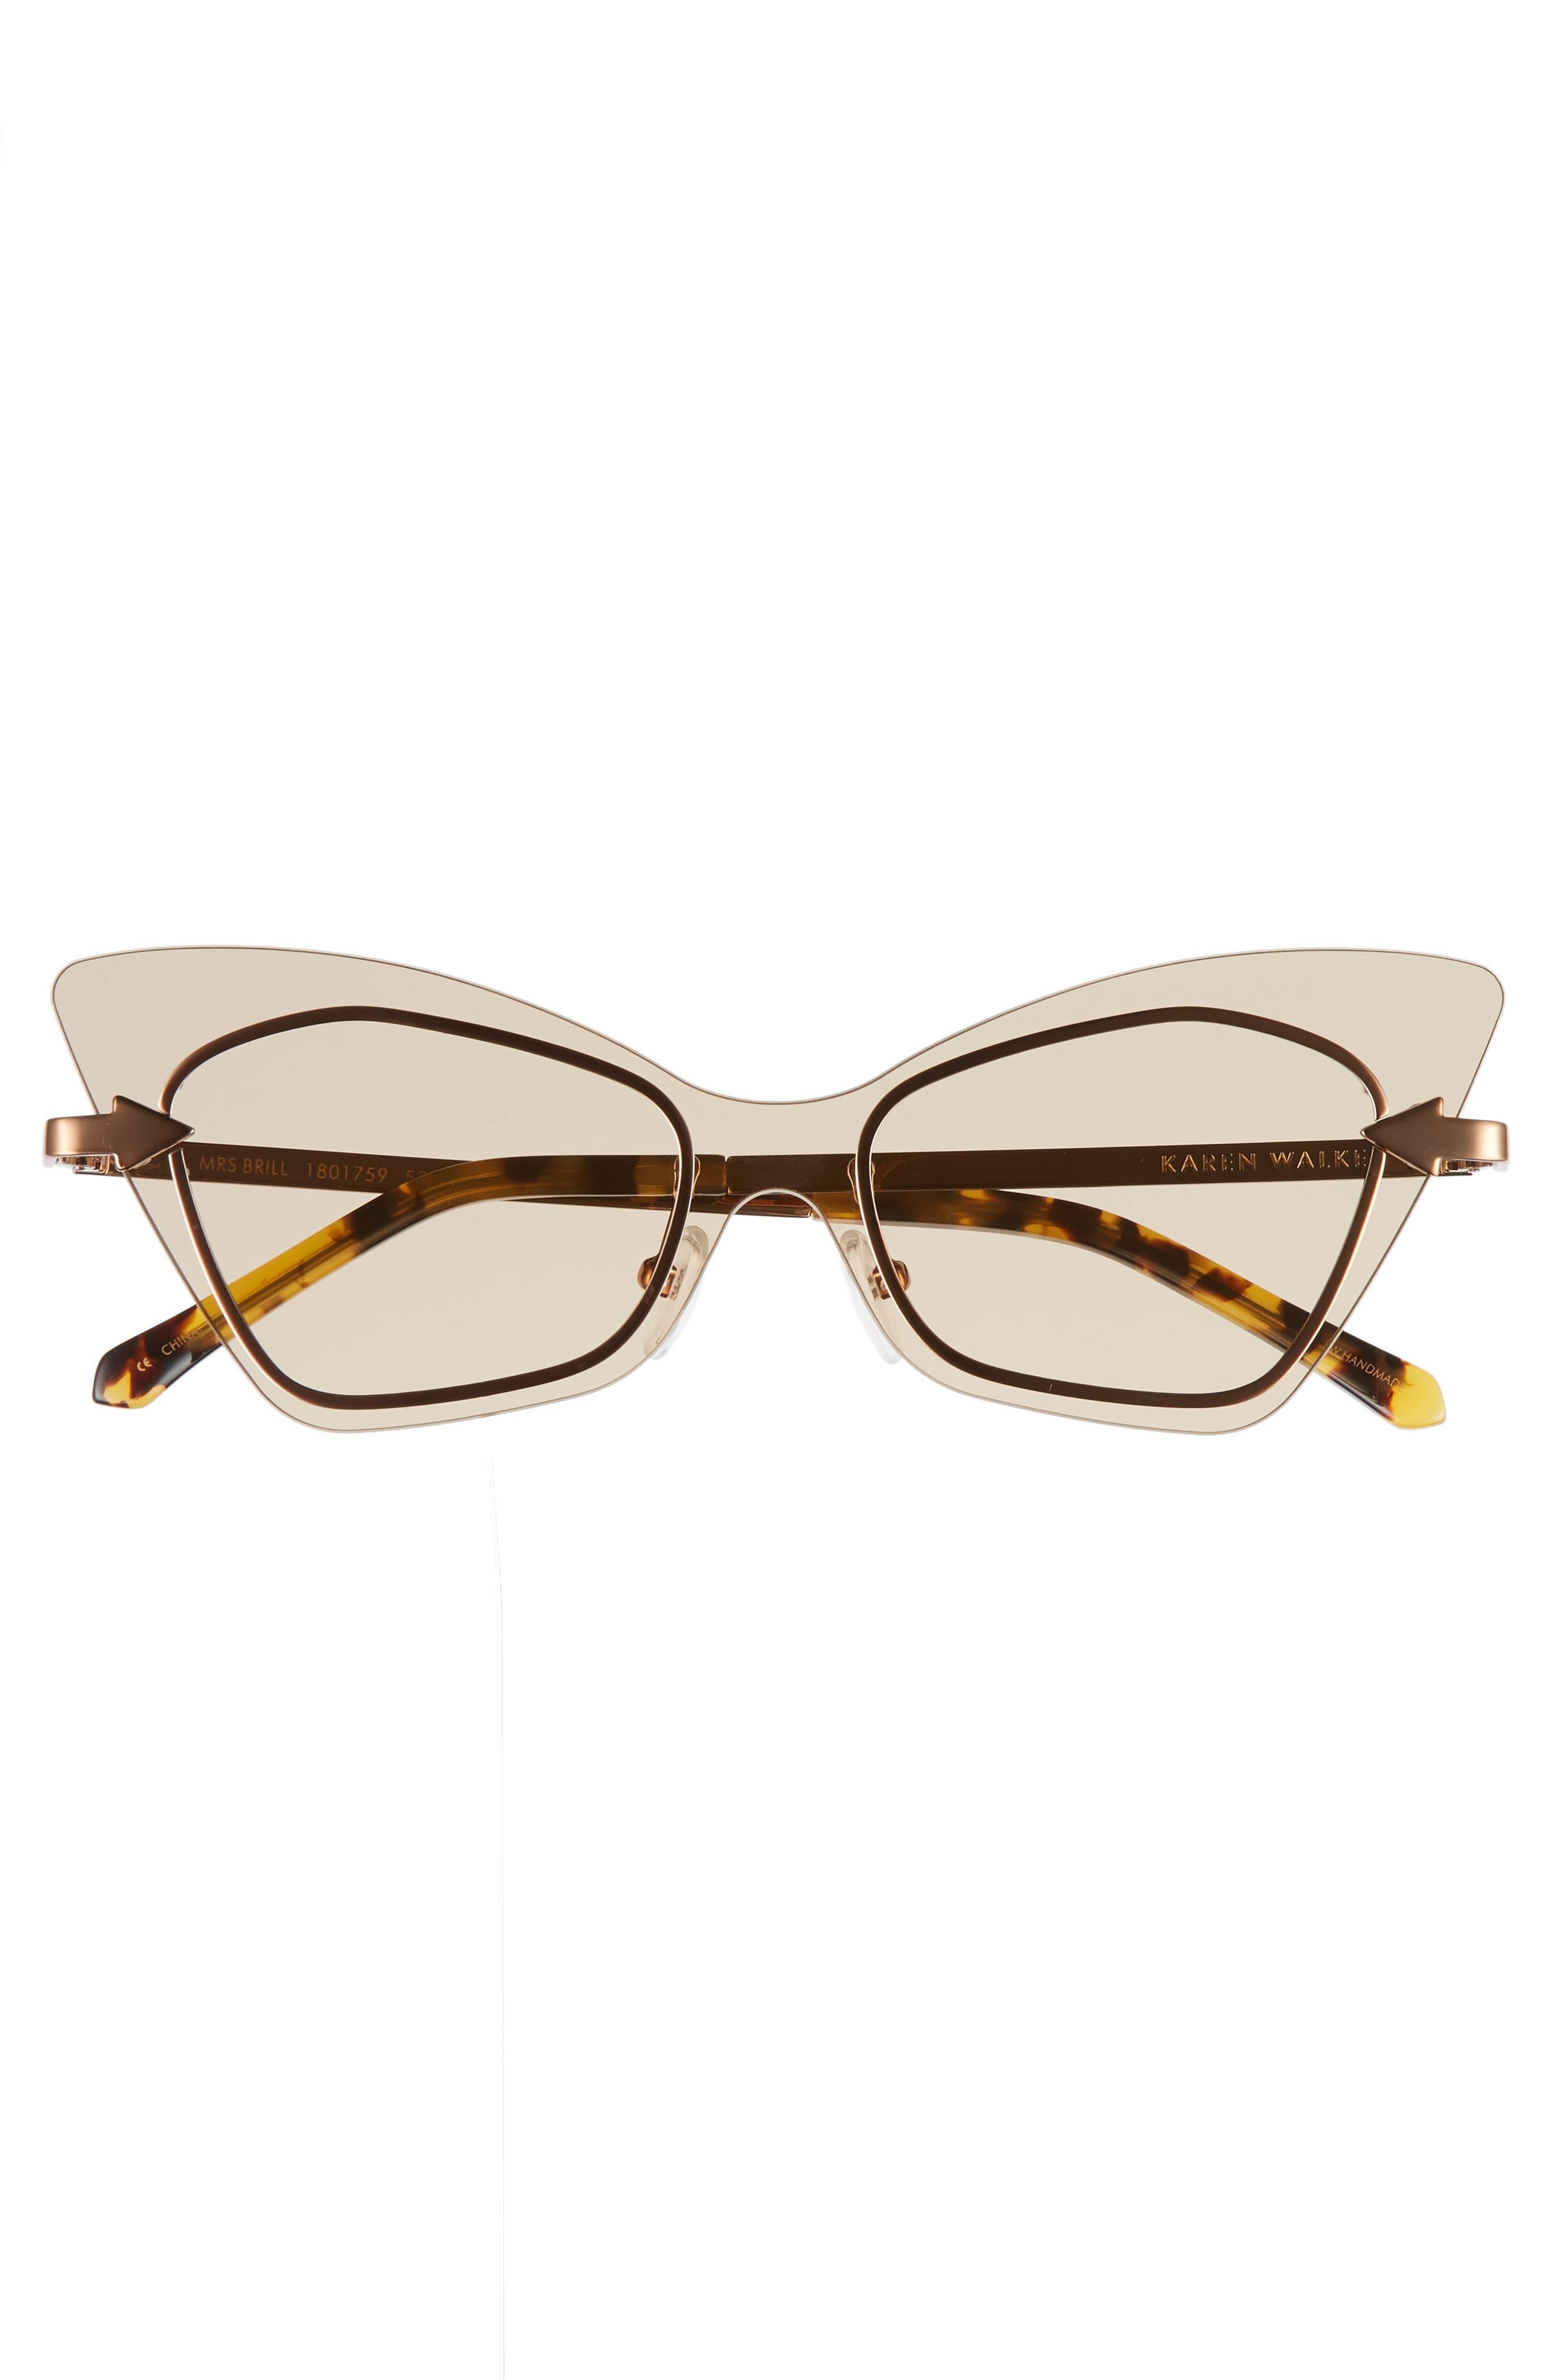 Mrs. Brill 53mm Cat Eye Sunglasses,                             Alternate thumbnail 3, color,                             Crazy Tortoise